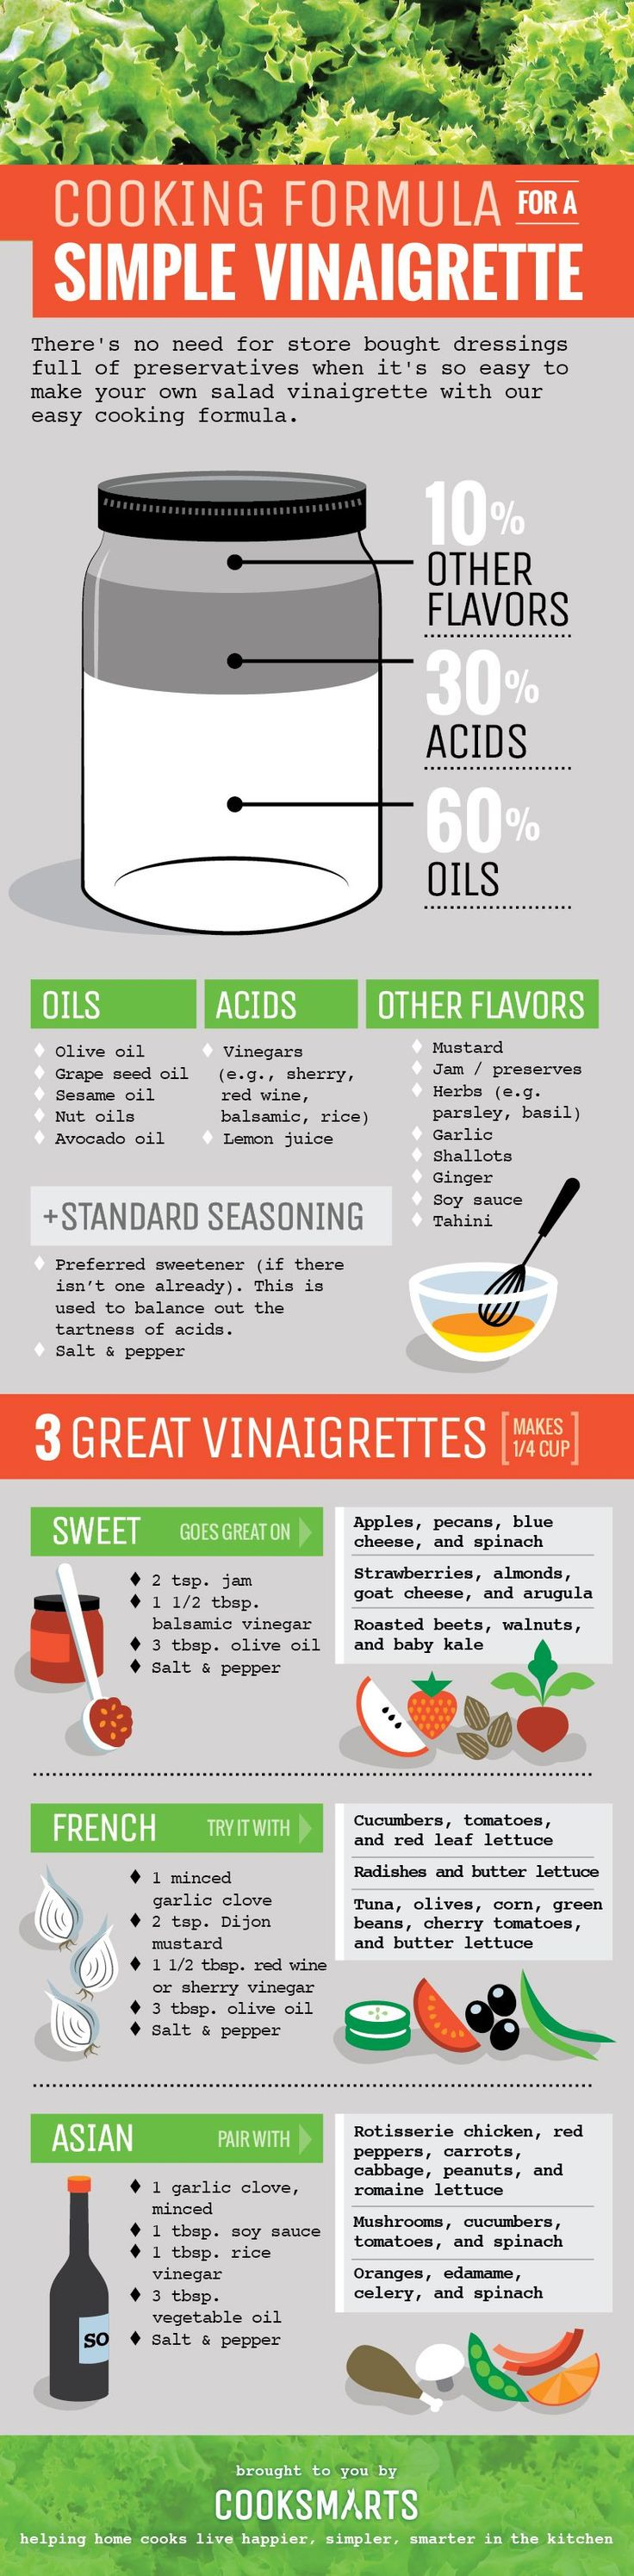 Cooking Formulas for Salad Vinaigrettes via @Cook Smarts #infographic